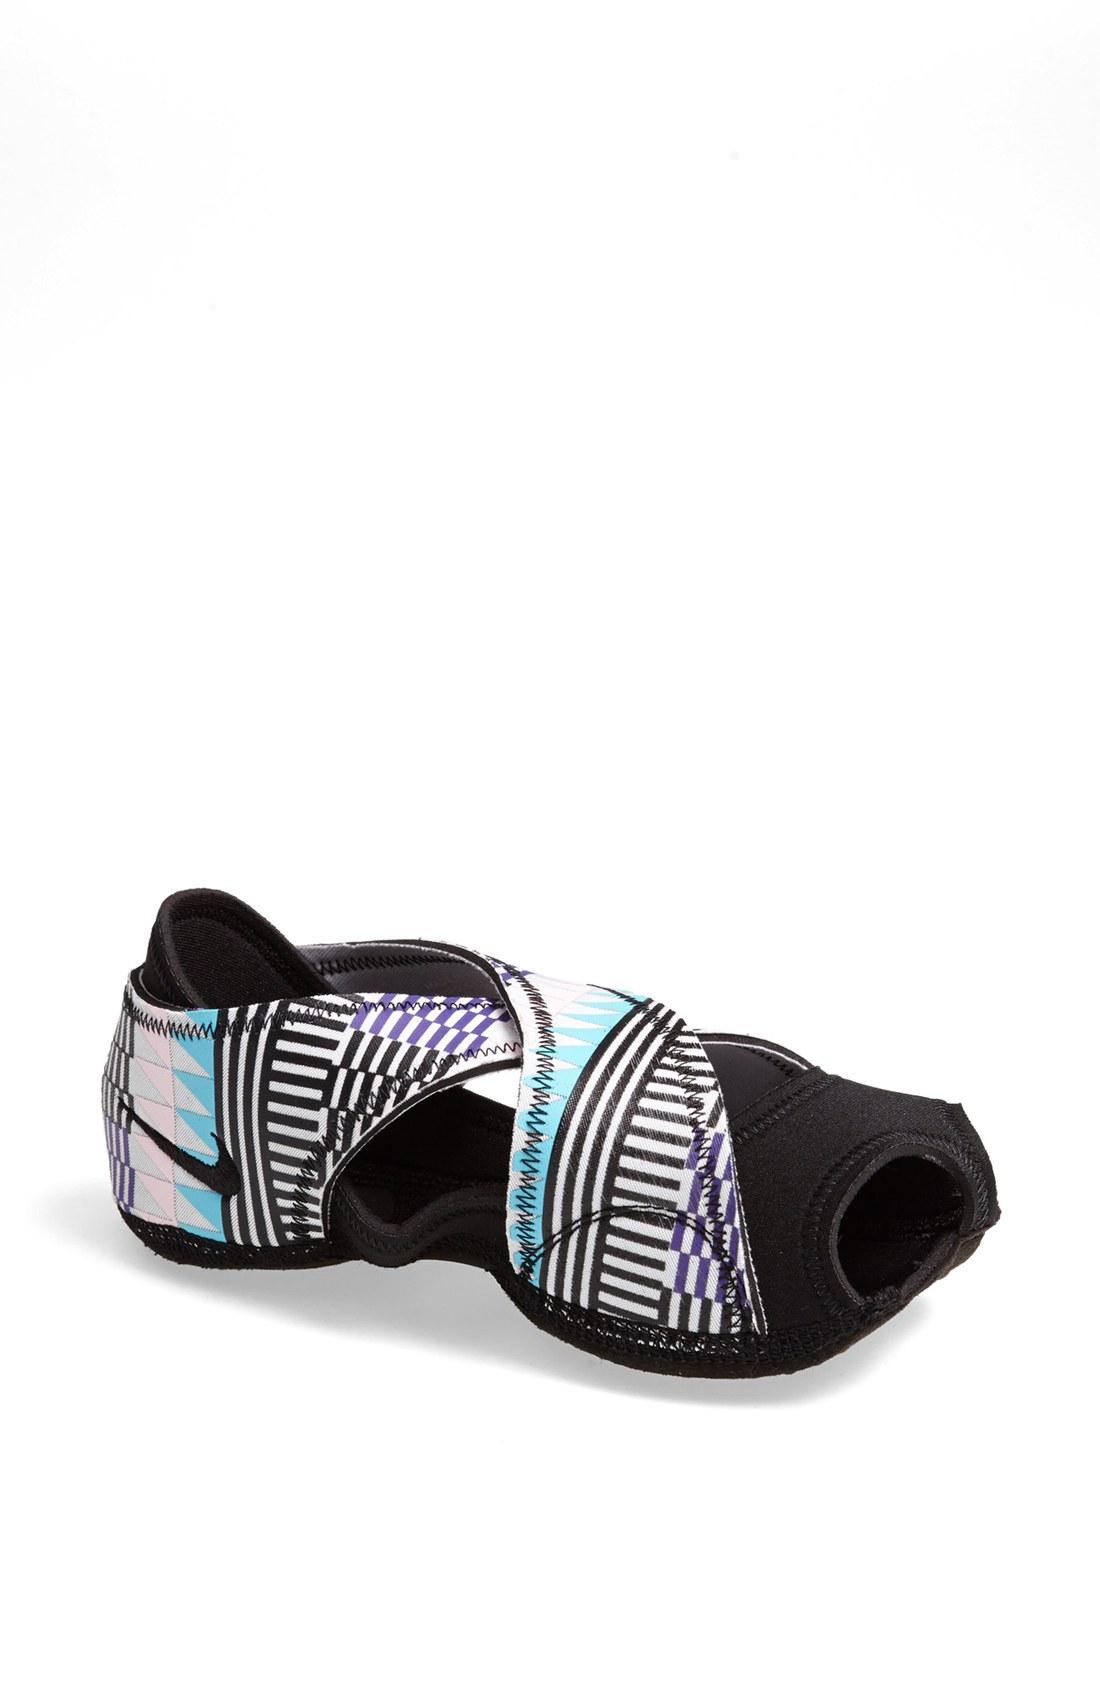 nike studio wrap training shoe in black black grey